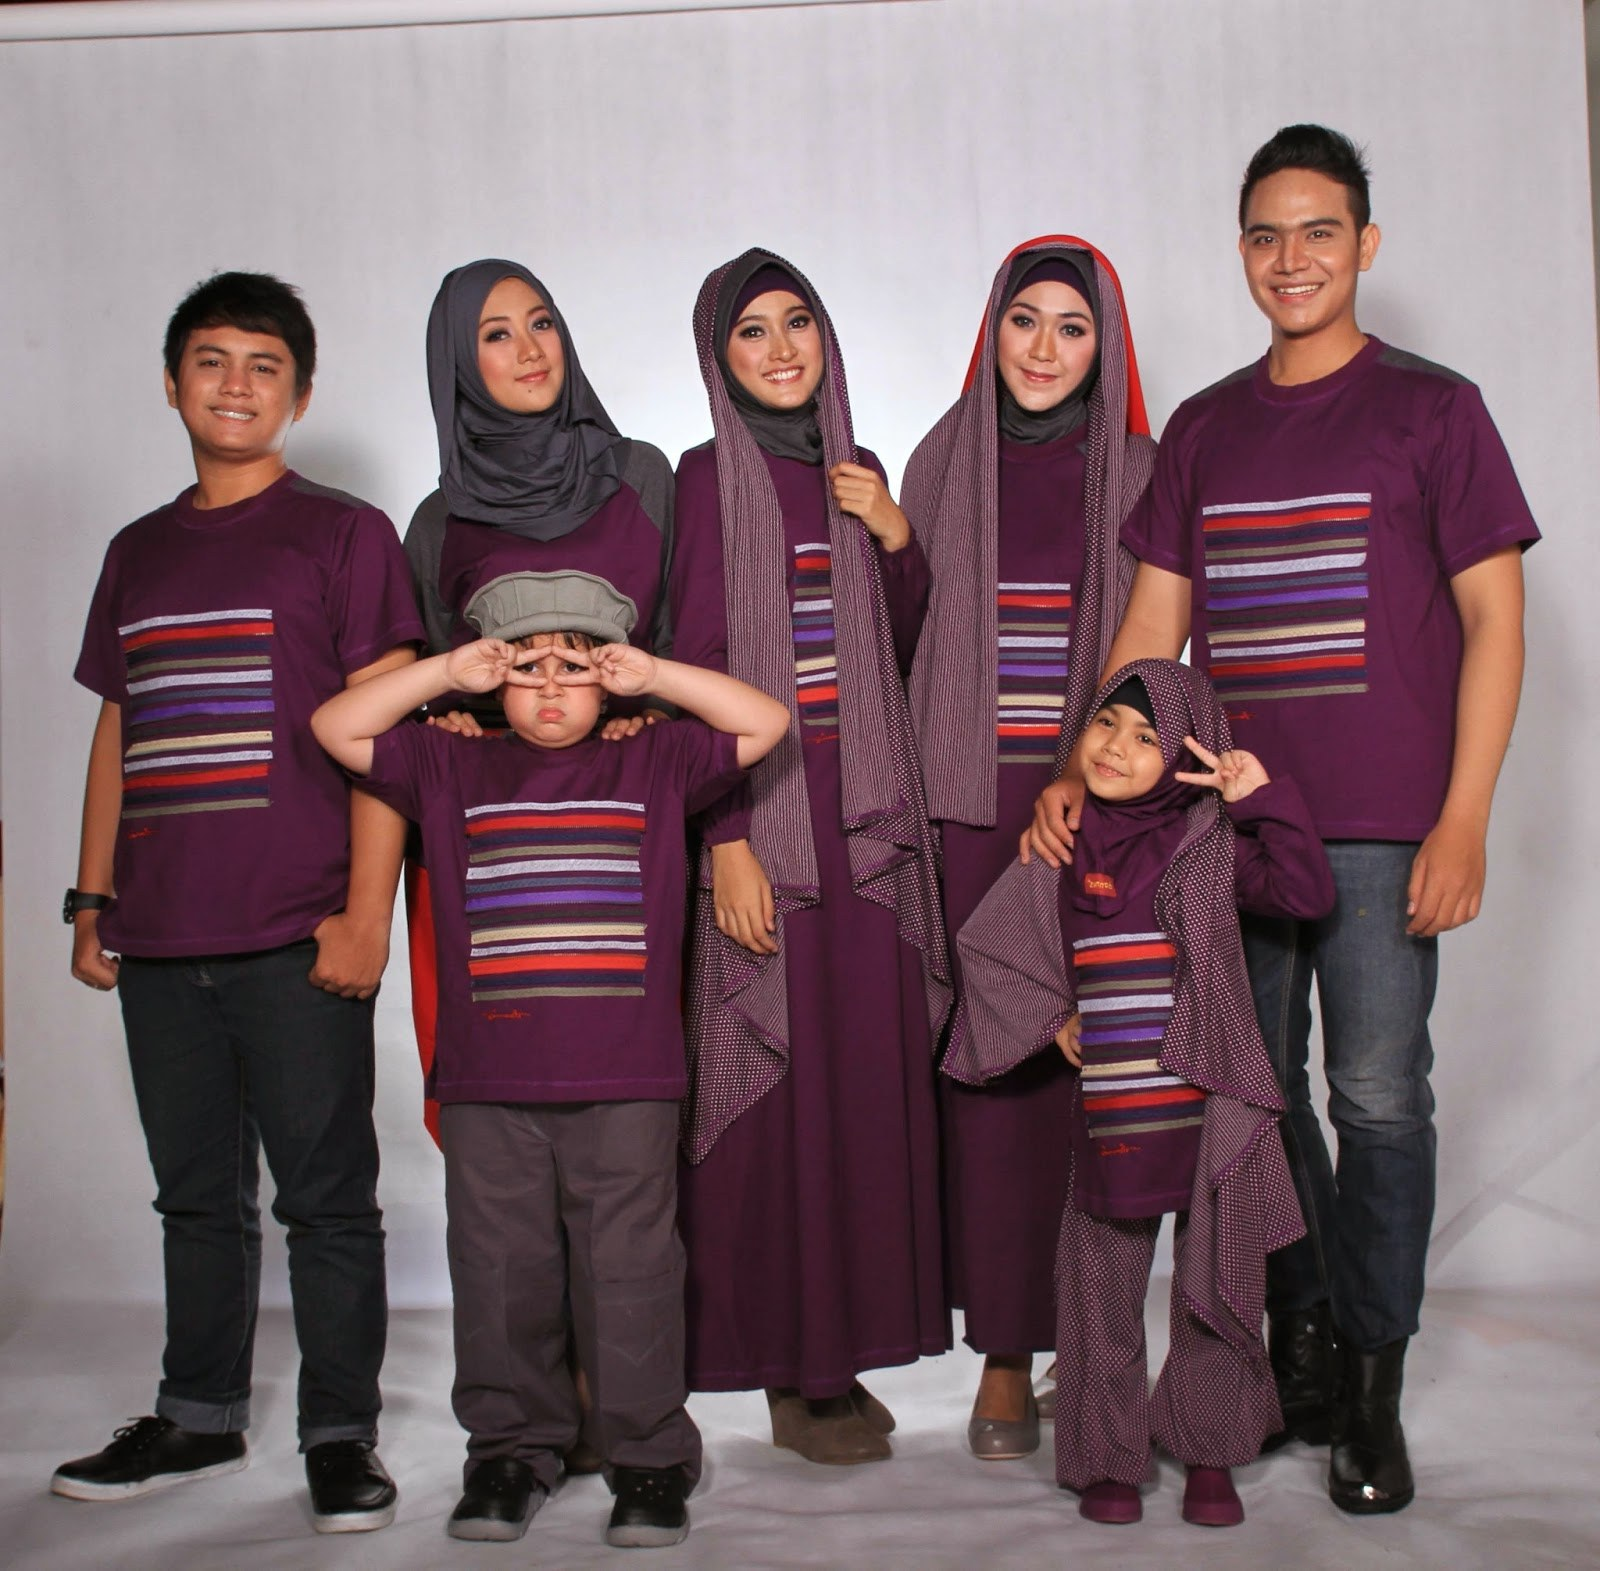 Bentuk Referensi Baju Lebaran Keluarga Jxdu Model Baju Keluarga Untuk Hari Raya Lebaran 2018